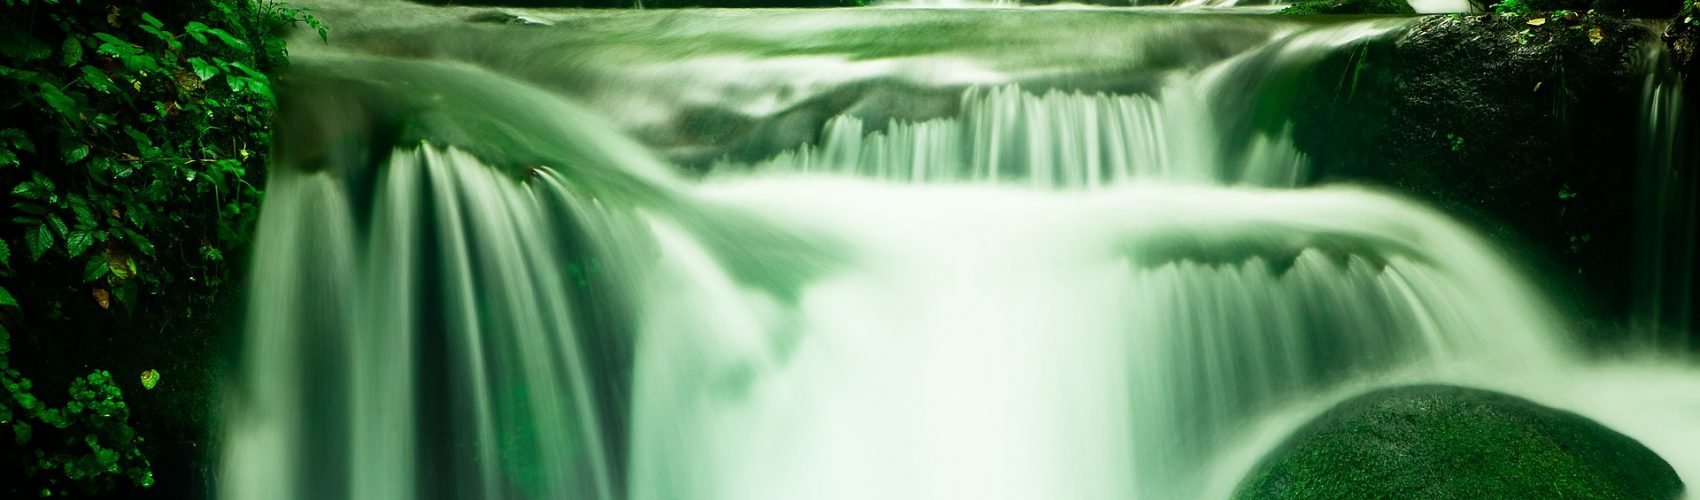 waterfall-1309204_1920